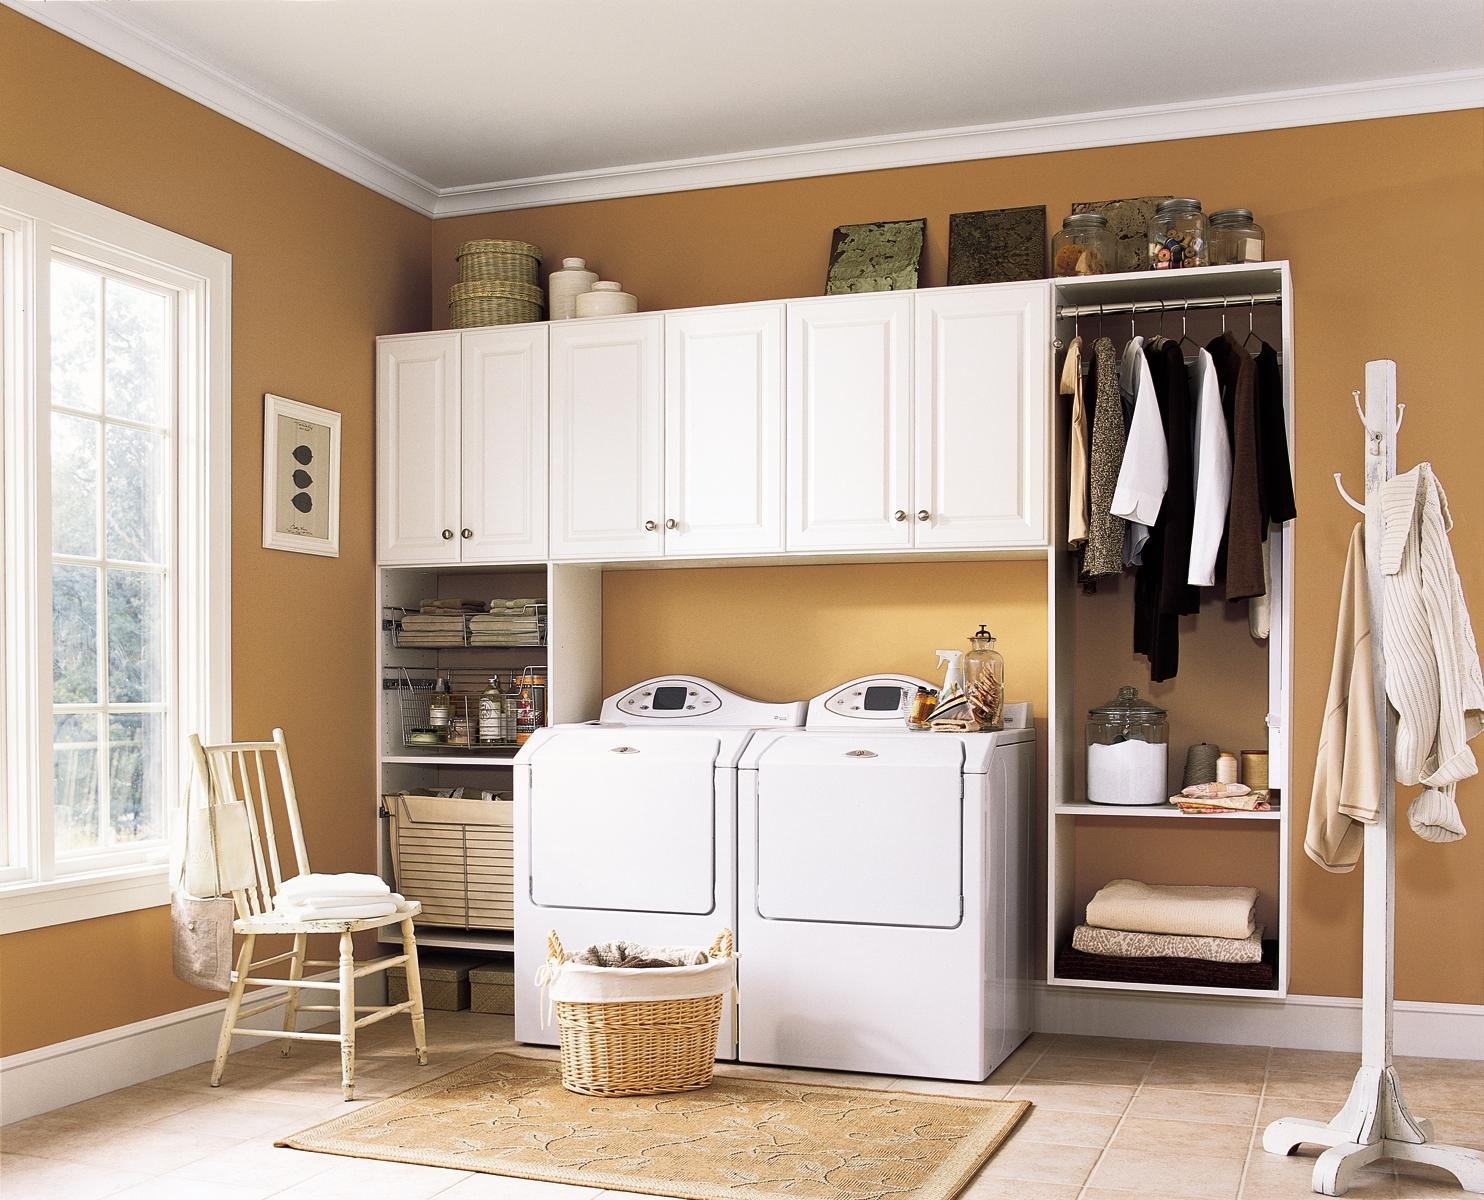 Laundry Room Storage Organization And Inspiration